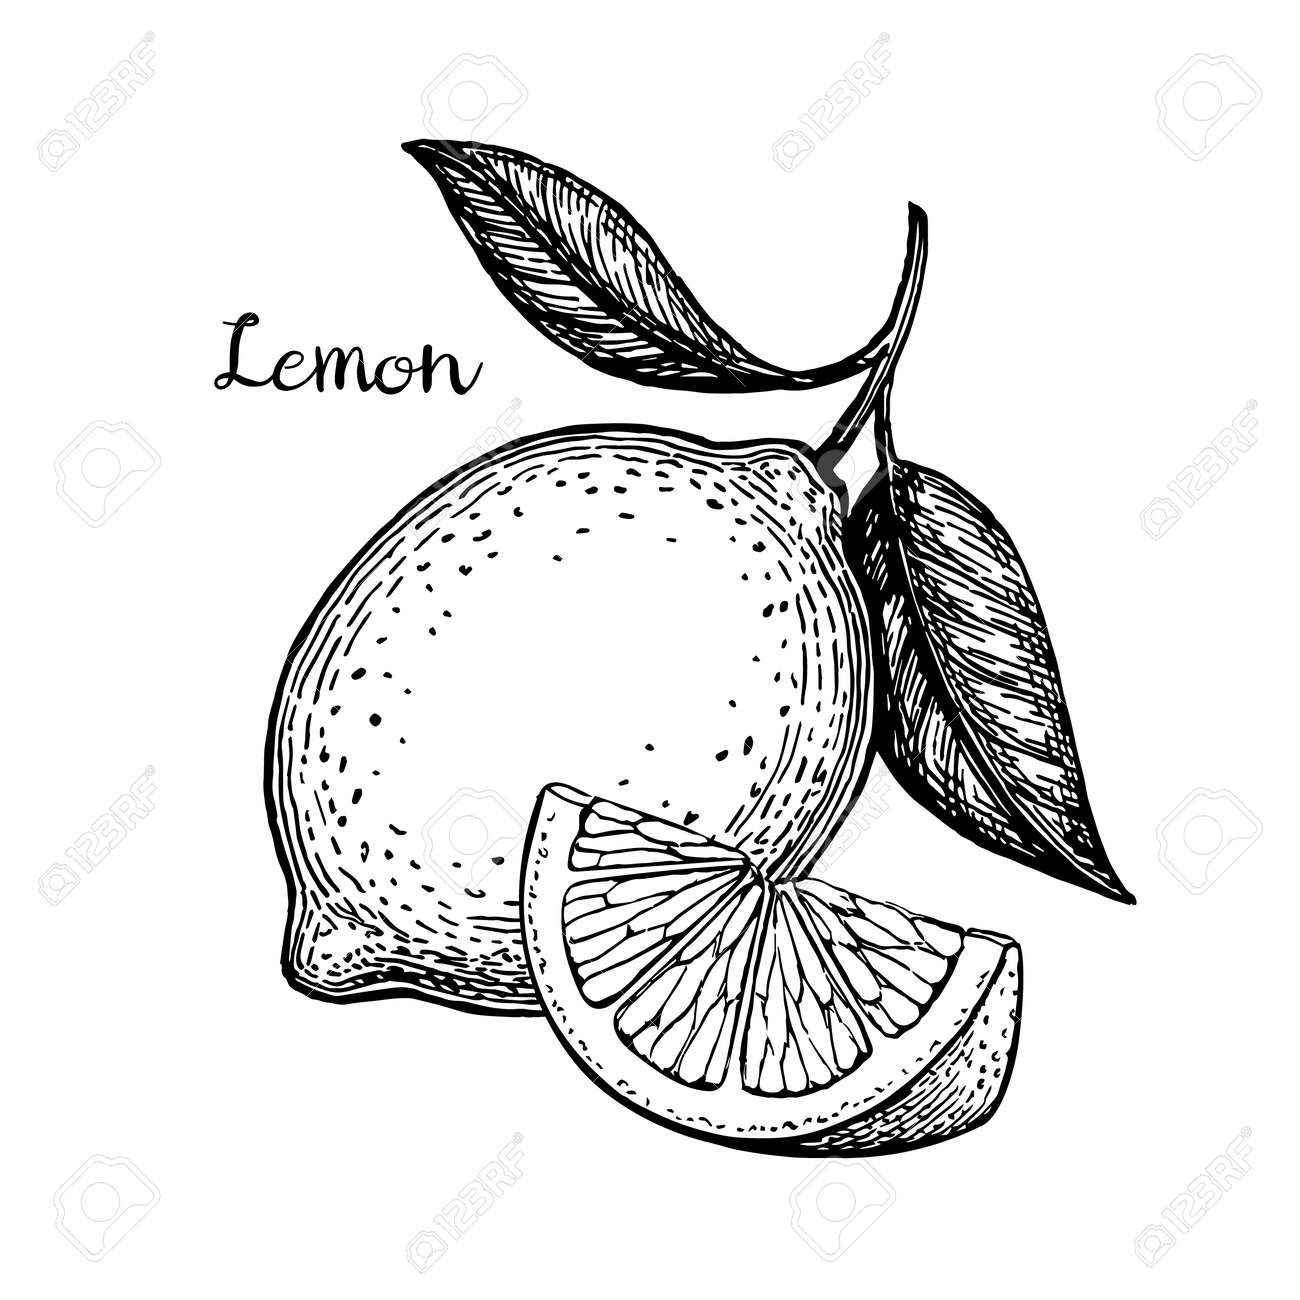 Hand drawn vector illustration of lemon. Isolated on white background. Retro style. - 81695352